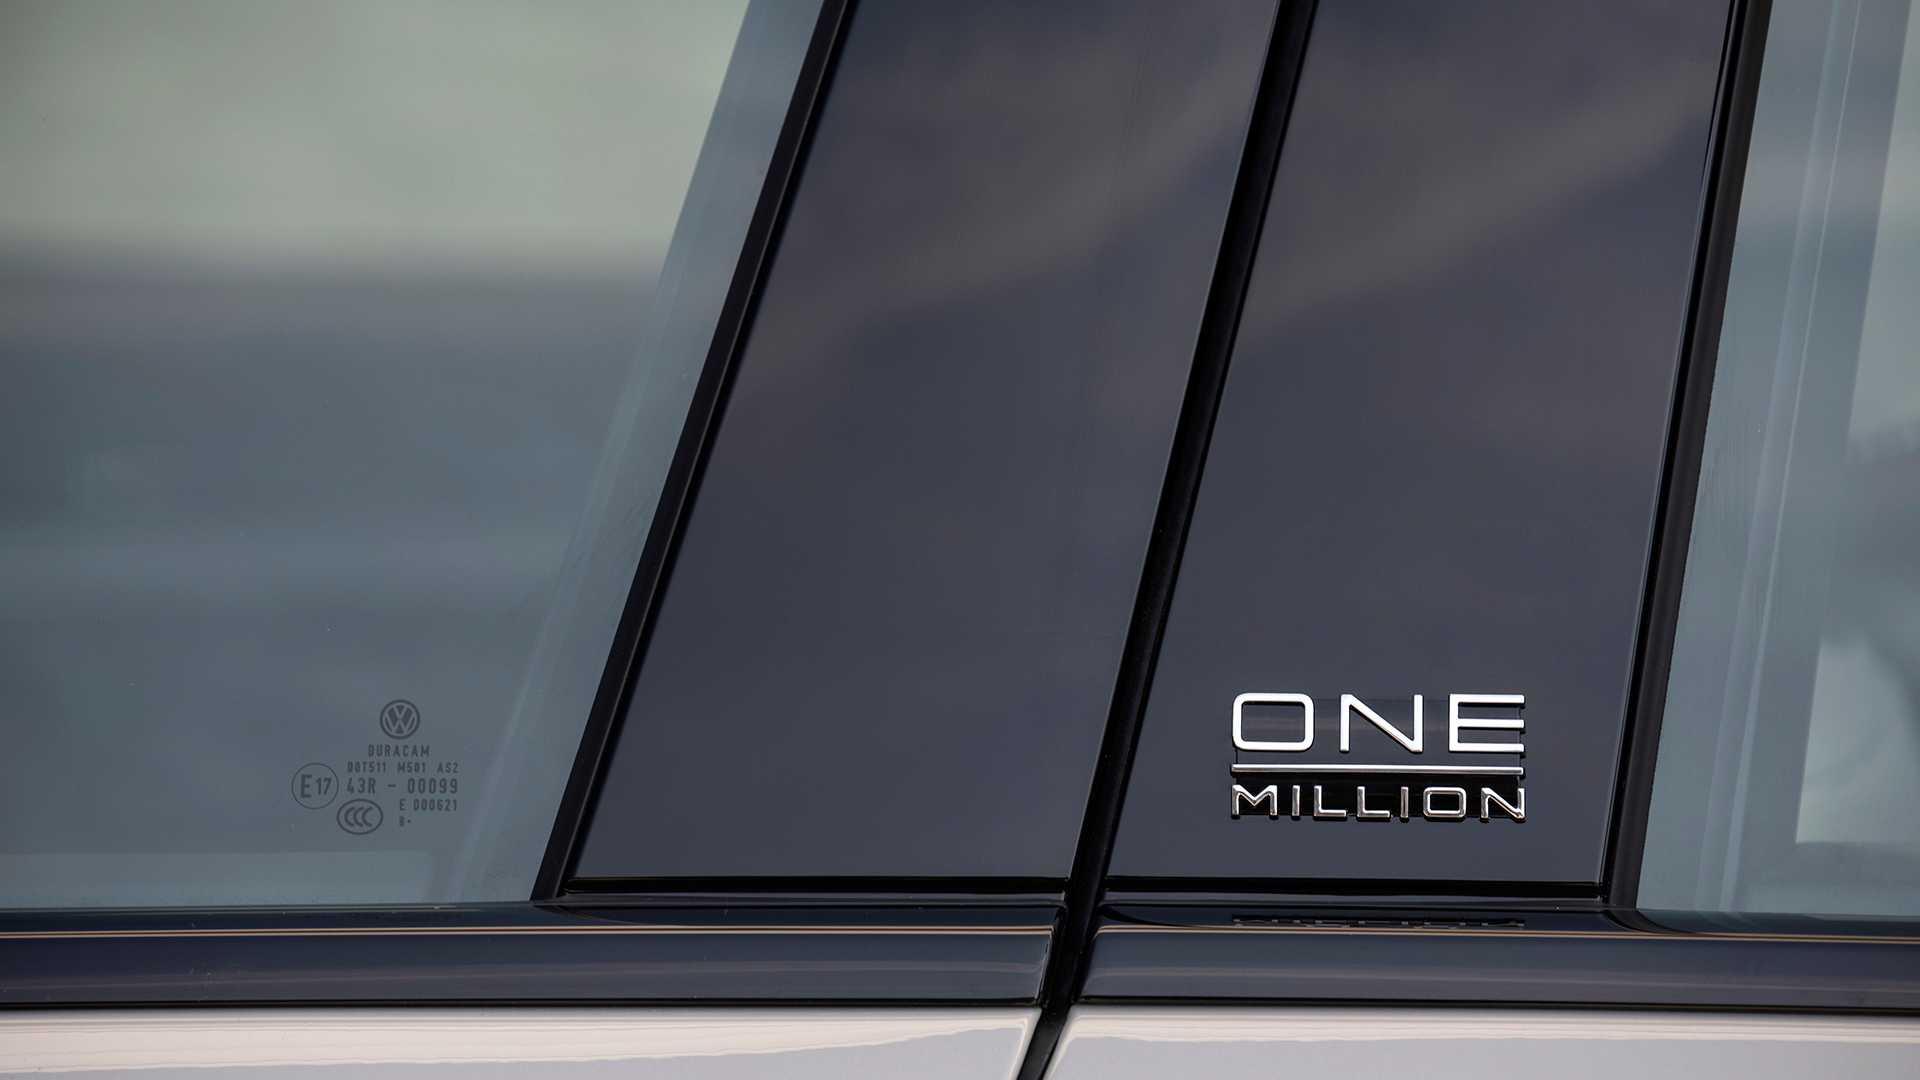 2019 Volkswagen Touareg ONE Million Detail Wallpapers (6)